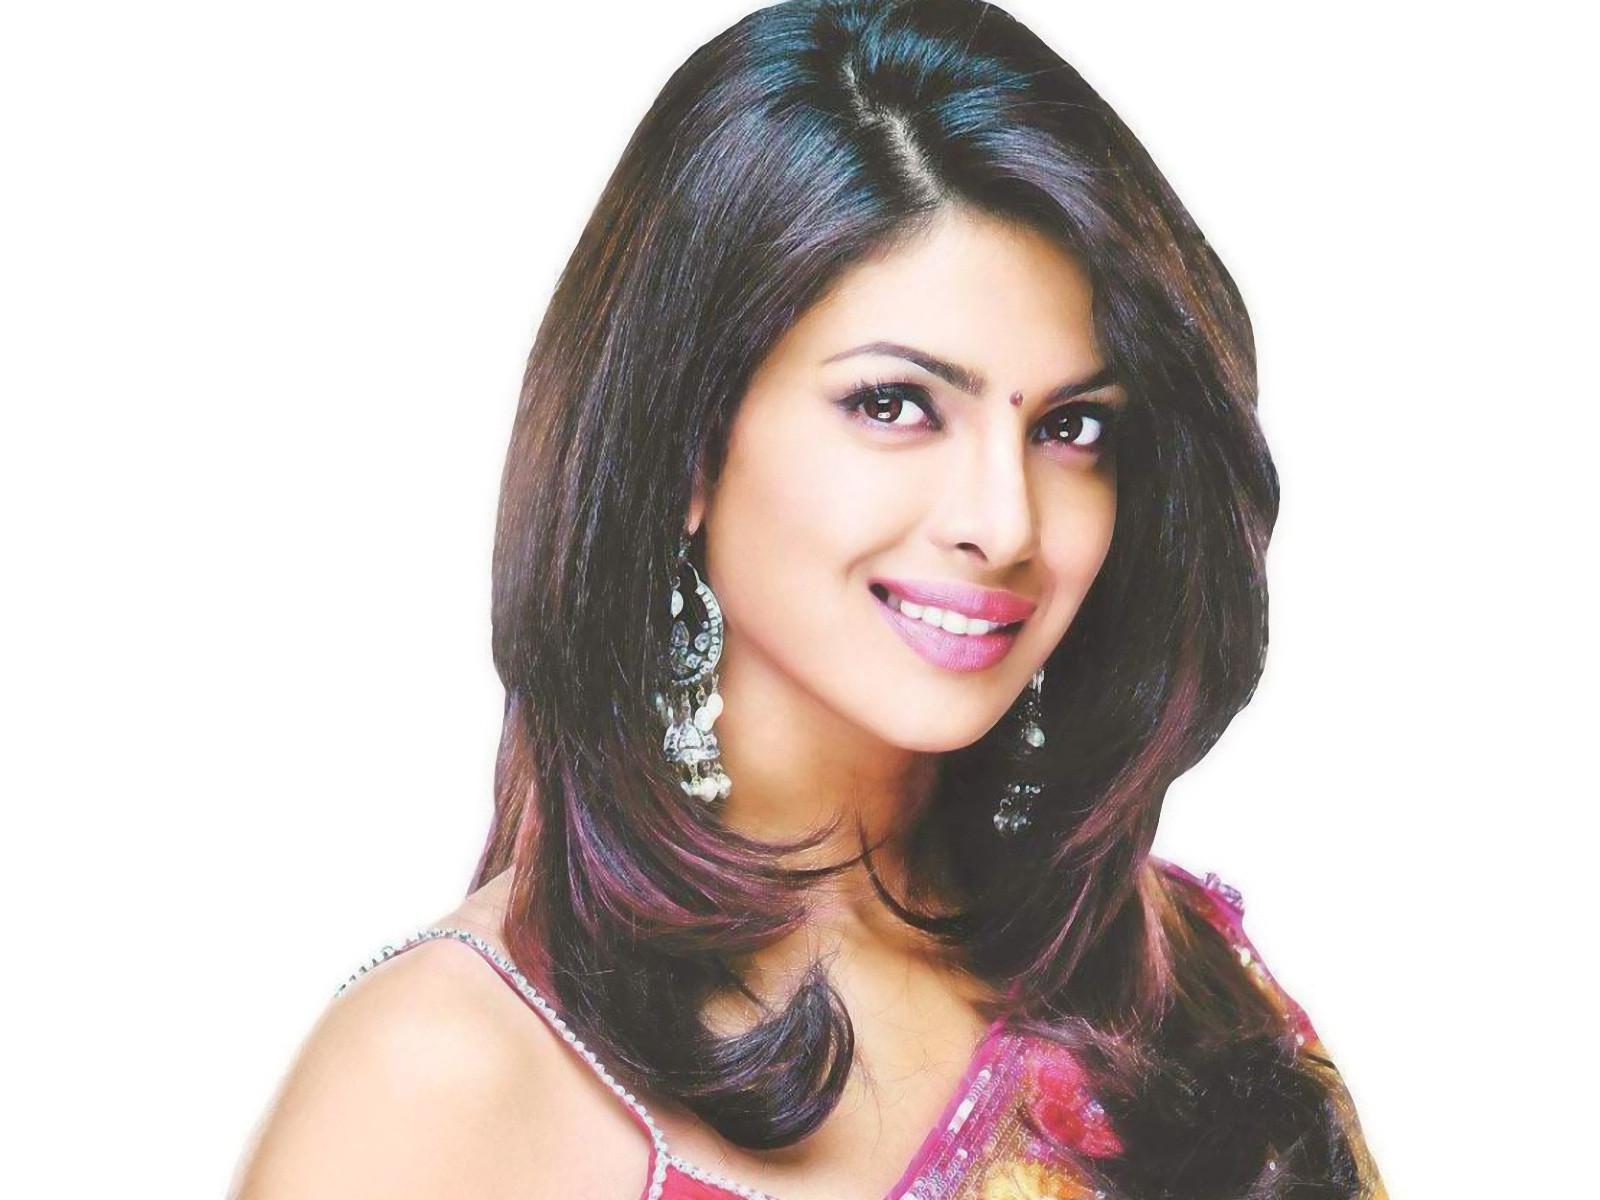 Priyanka Chopra Haircuts  Priyanka Chopra Hairstyles with Indian Outfits Indian